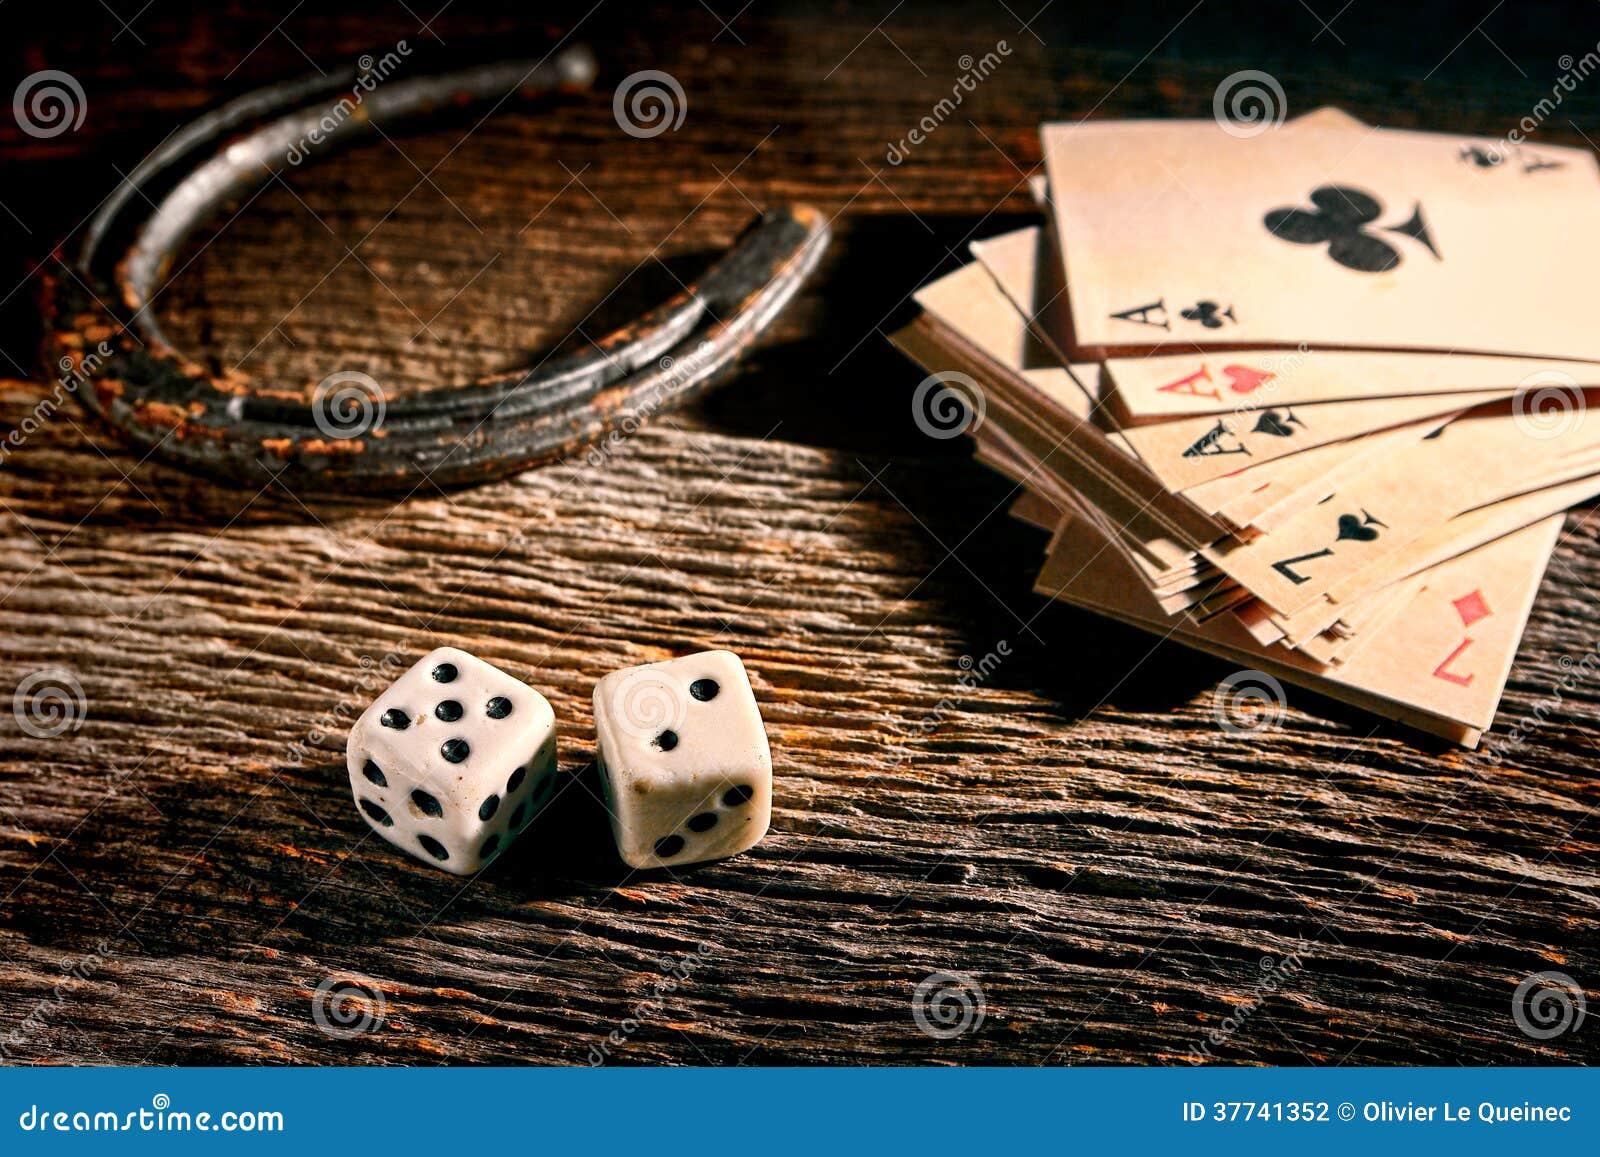 Casino guru Lucky Ace62102